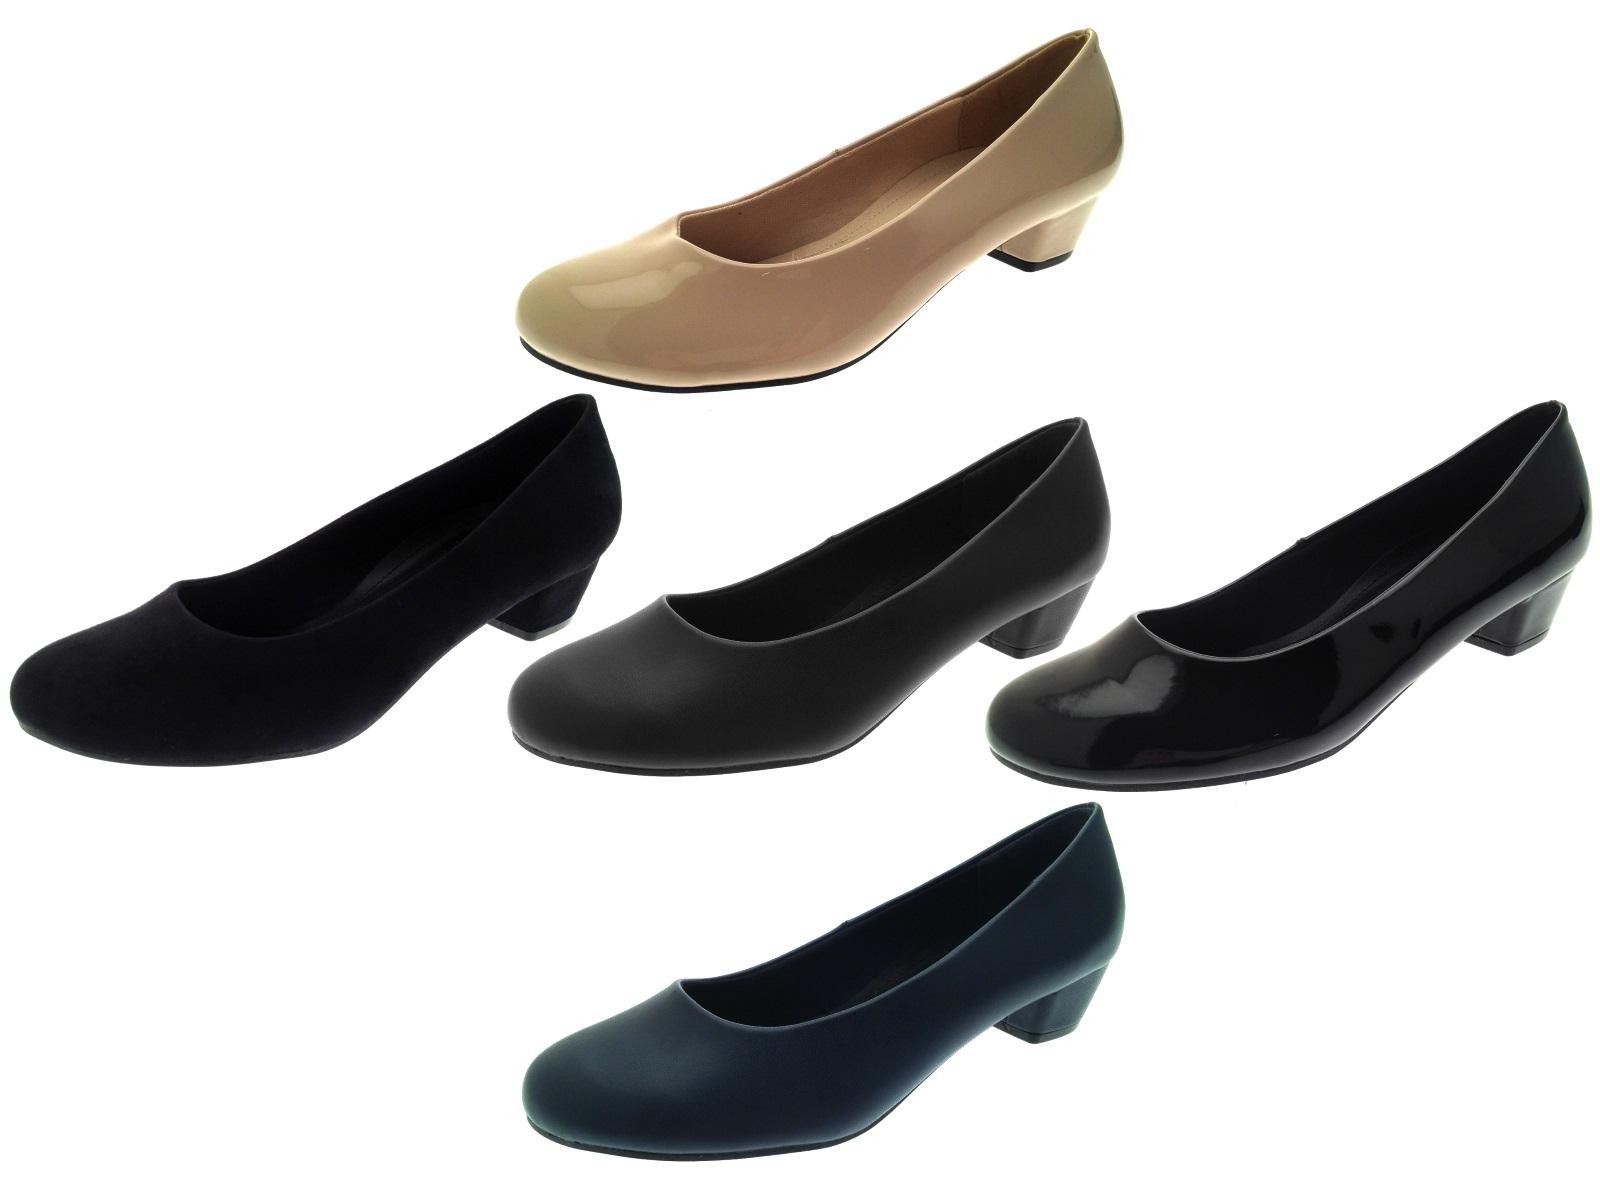 Womens Low Block Heels Comfort Work Office Loafers Smart Court Shoes ... 2227553738